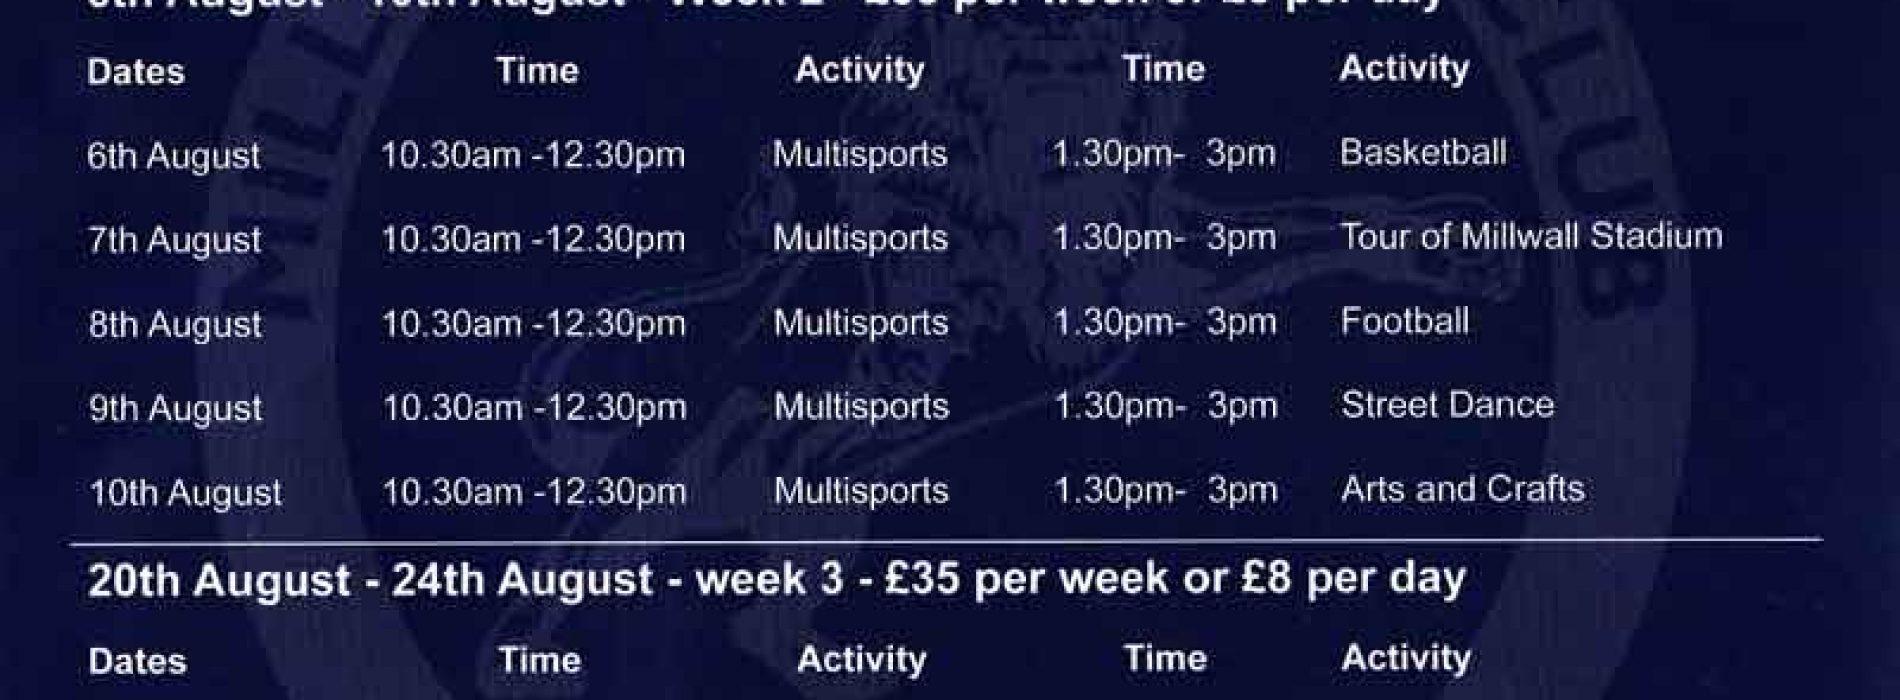 Millwall Community Trust's Summer 2018 Courses